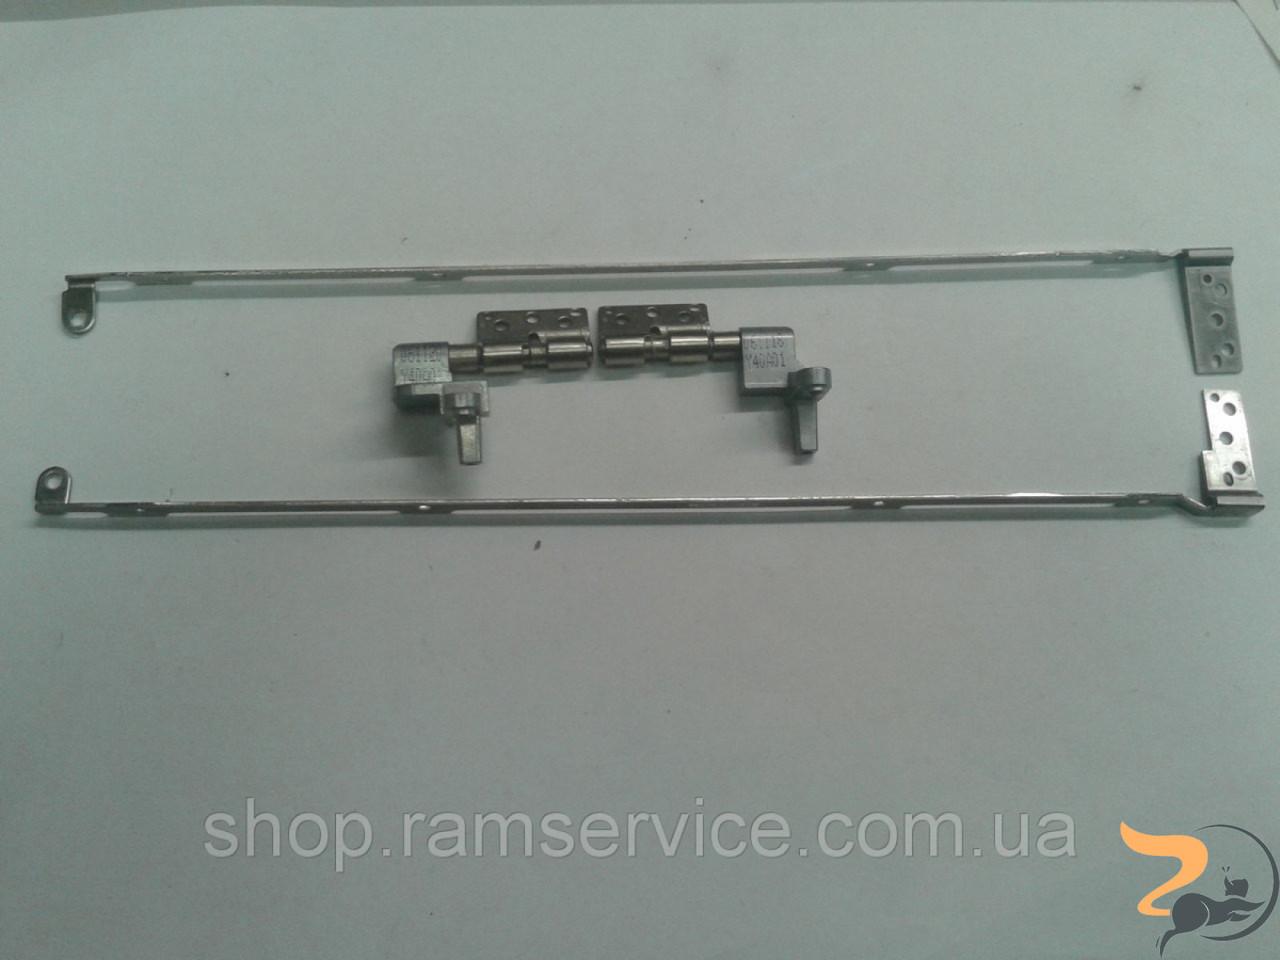 Петлі для ноутбука Fujitsu V3505, *33.4b606.001, 33.4b607.001, б/в